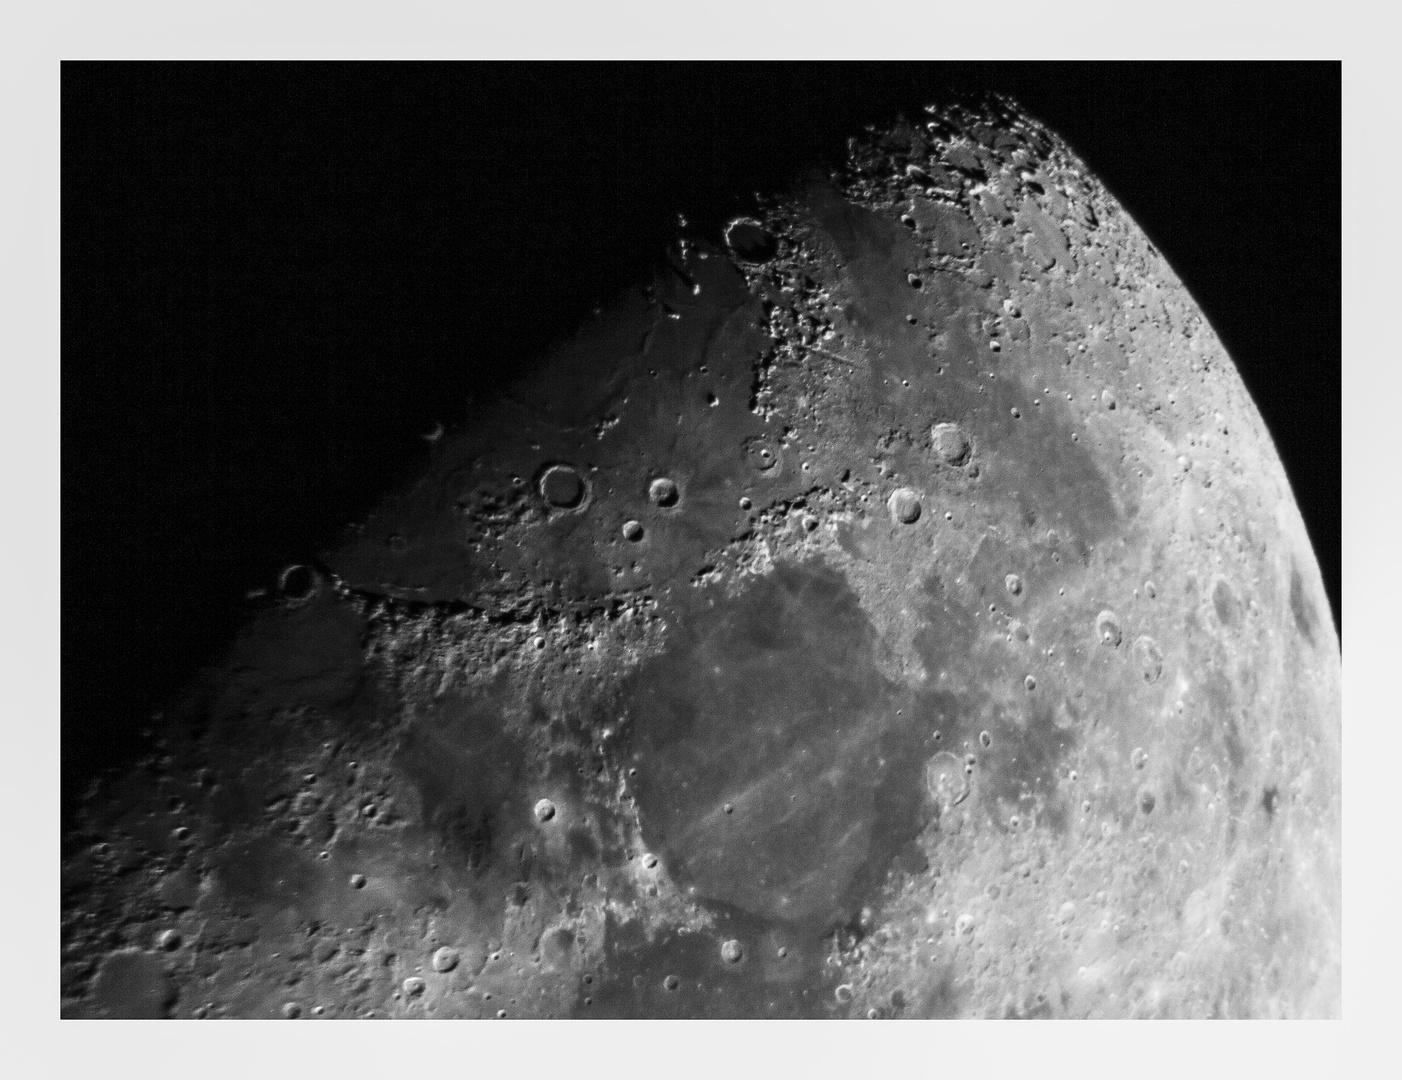 Mondserie 2